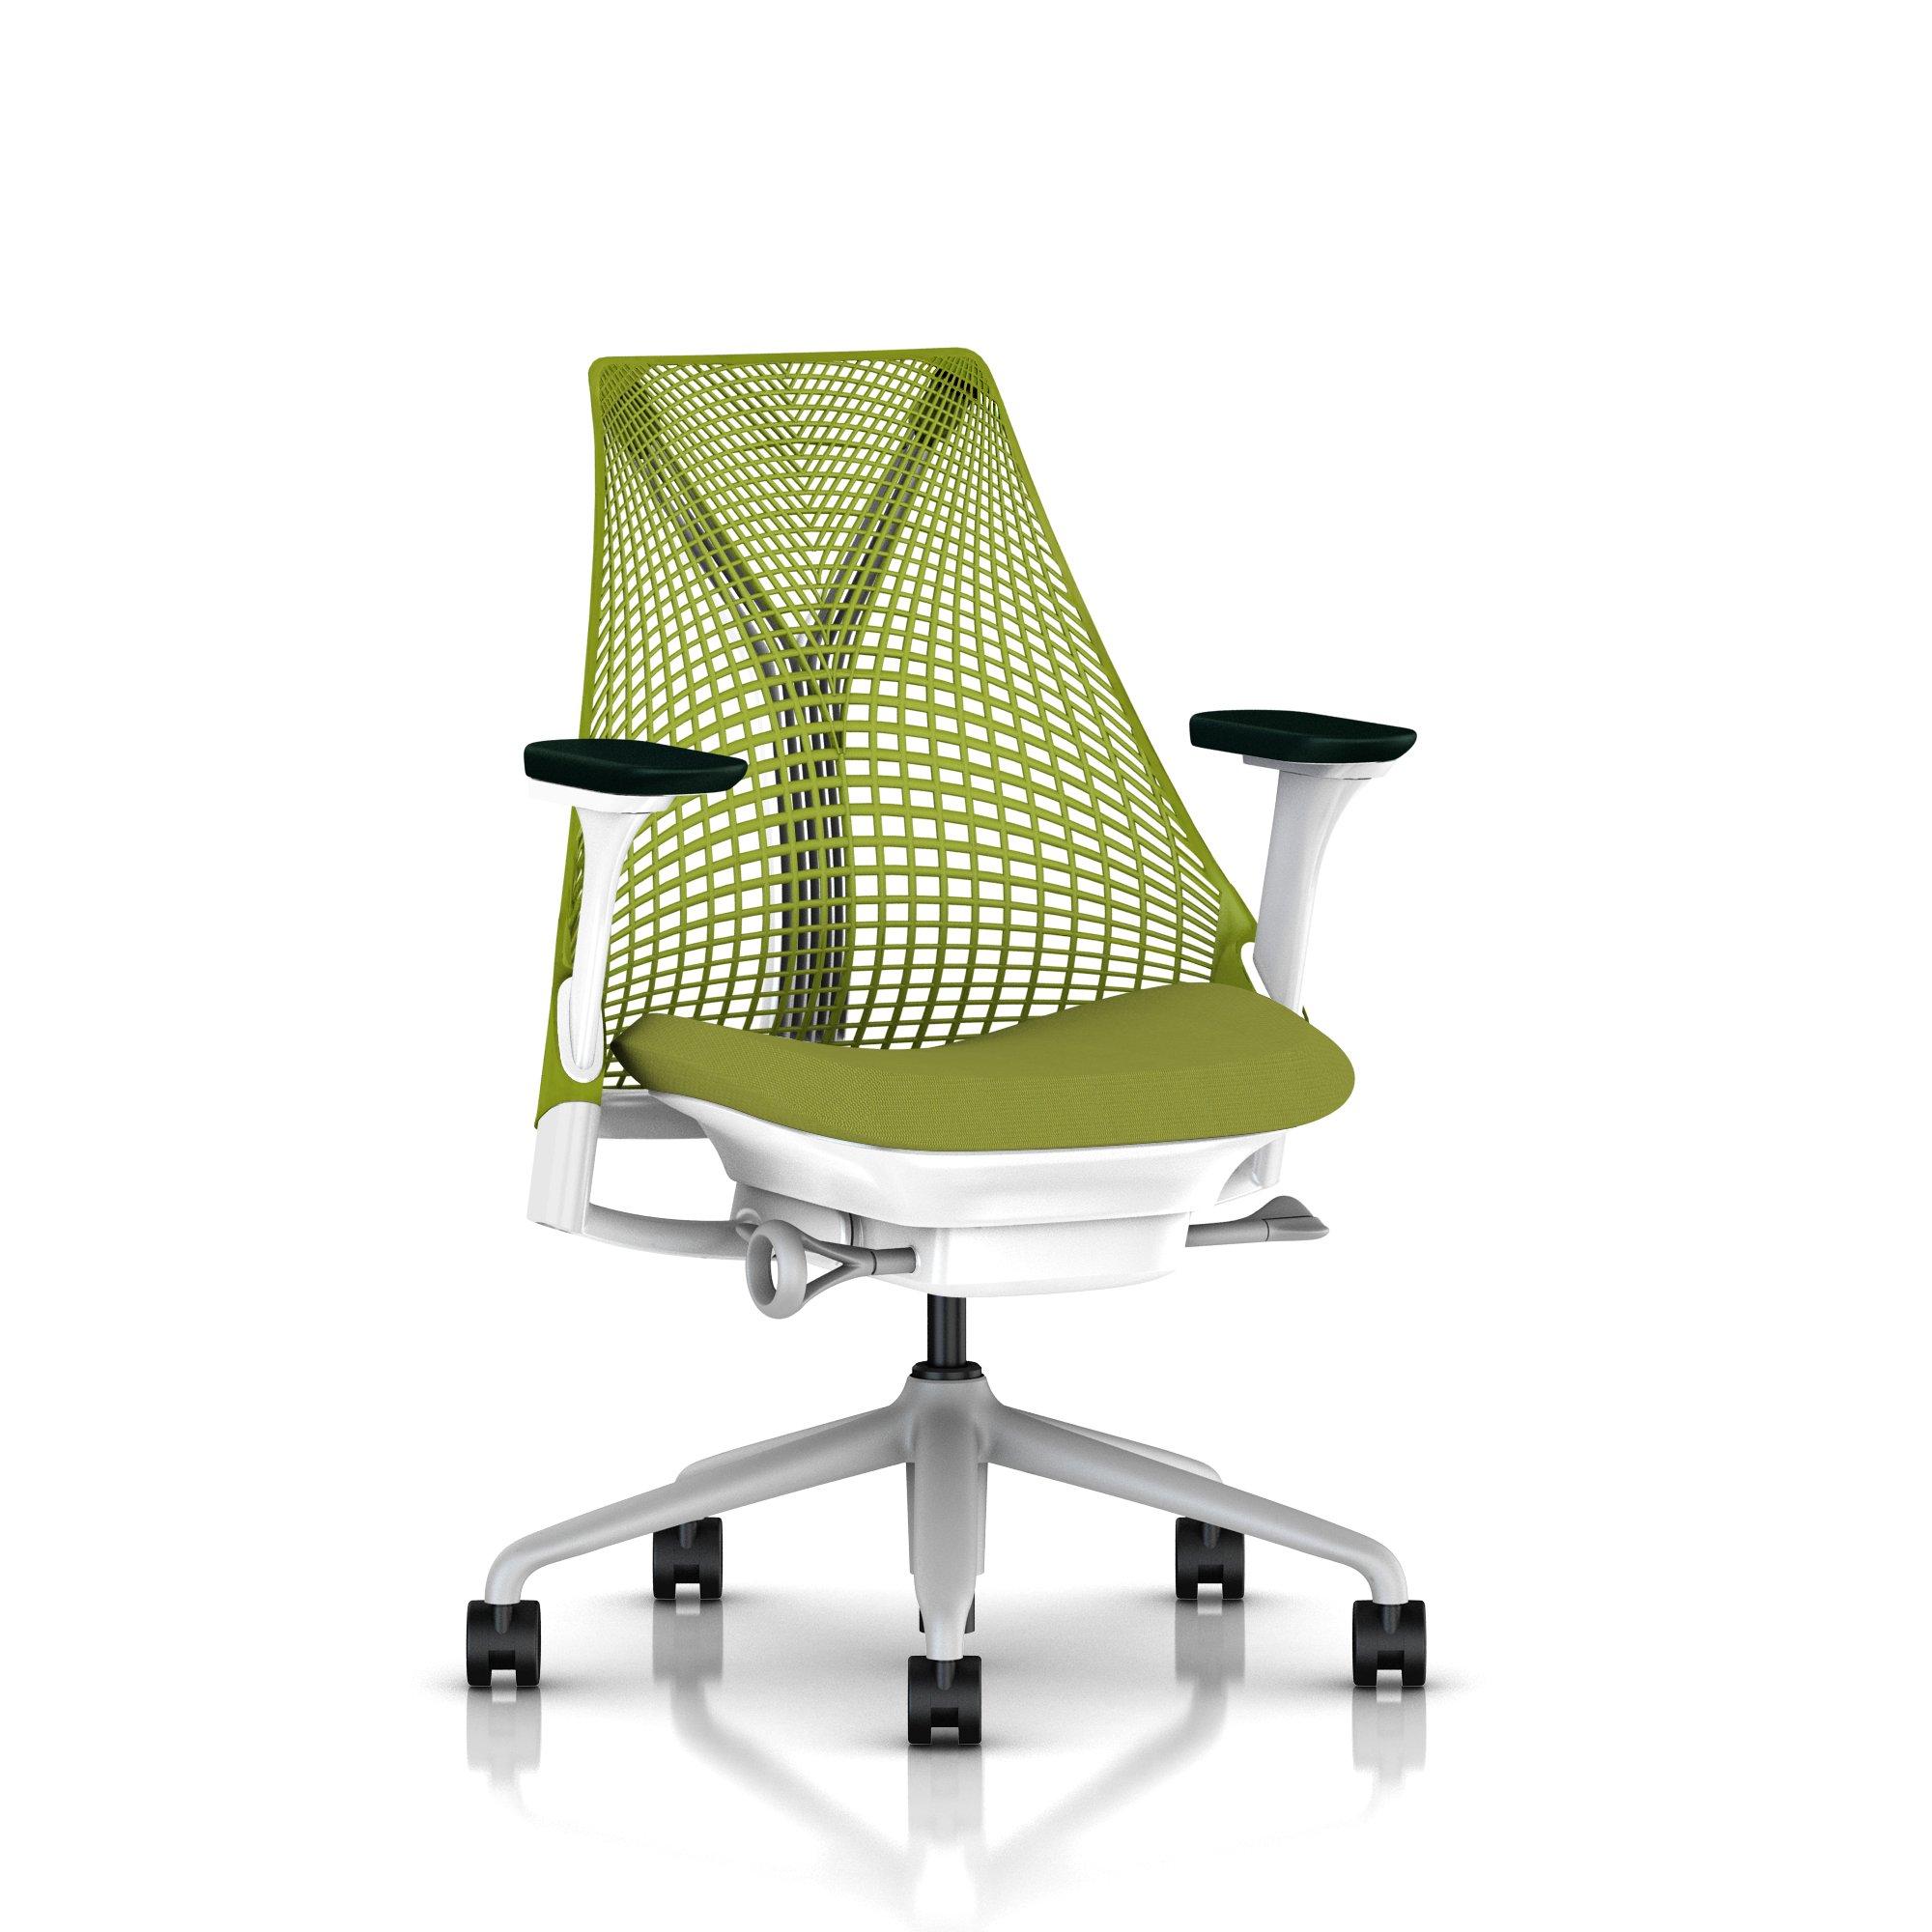 Sayl Chair usd 1182.47] herman miller sayl chair - taobao agent  tmall agent